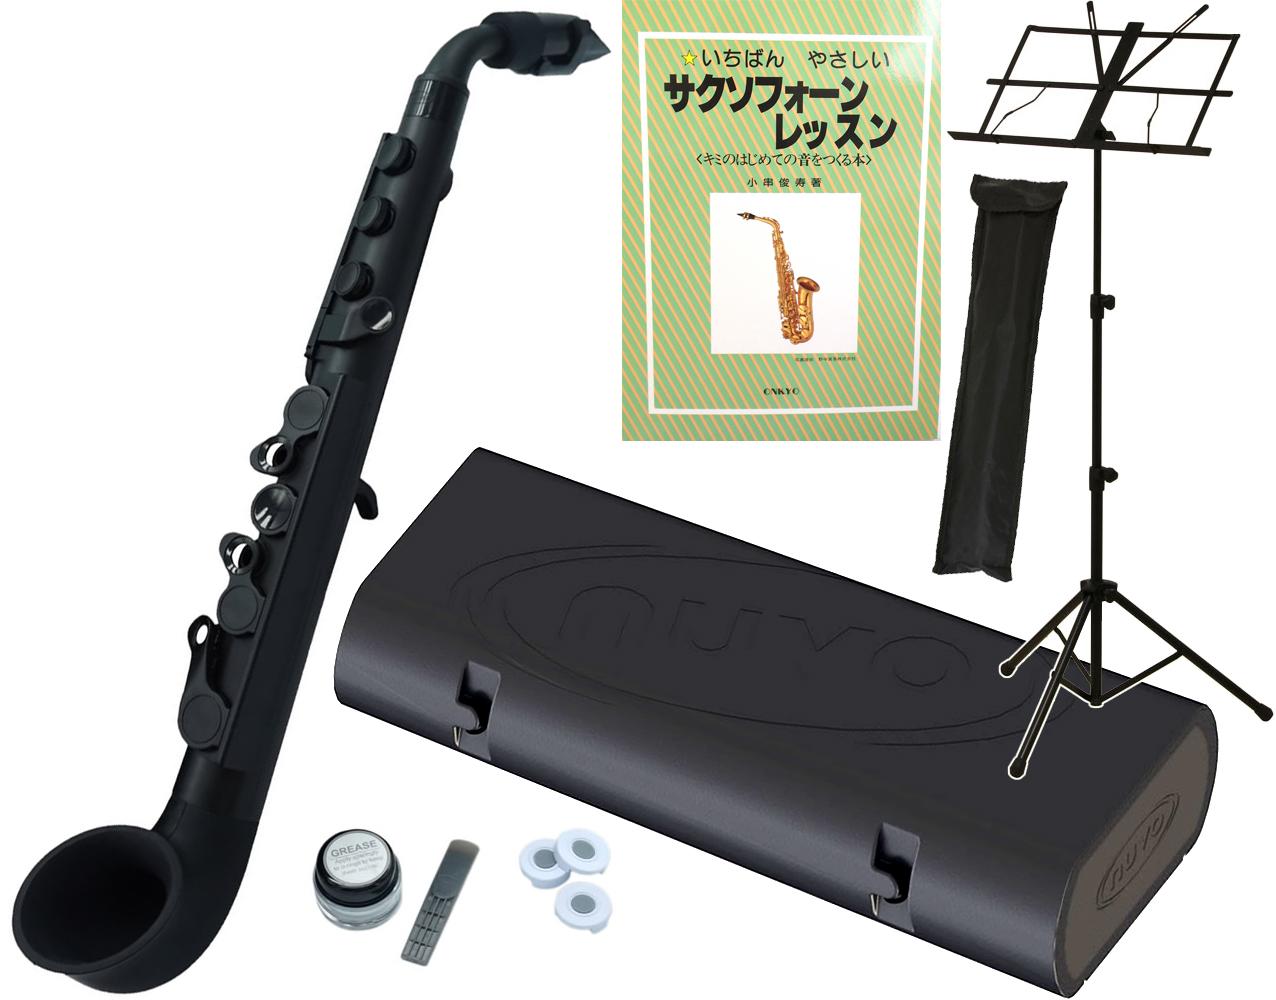 NUVO ( ヌーボ ) jSAX オール ブラック N510JBBK プラスチック製 管楽器 サックス系 リード楽器 本体 サクソフォン 黒色 真っ黒 Black 【 jサックス BK/BK セット F】 送料無料